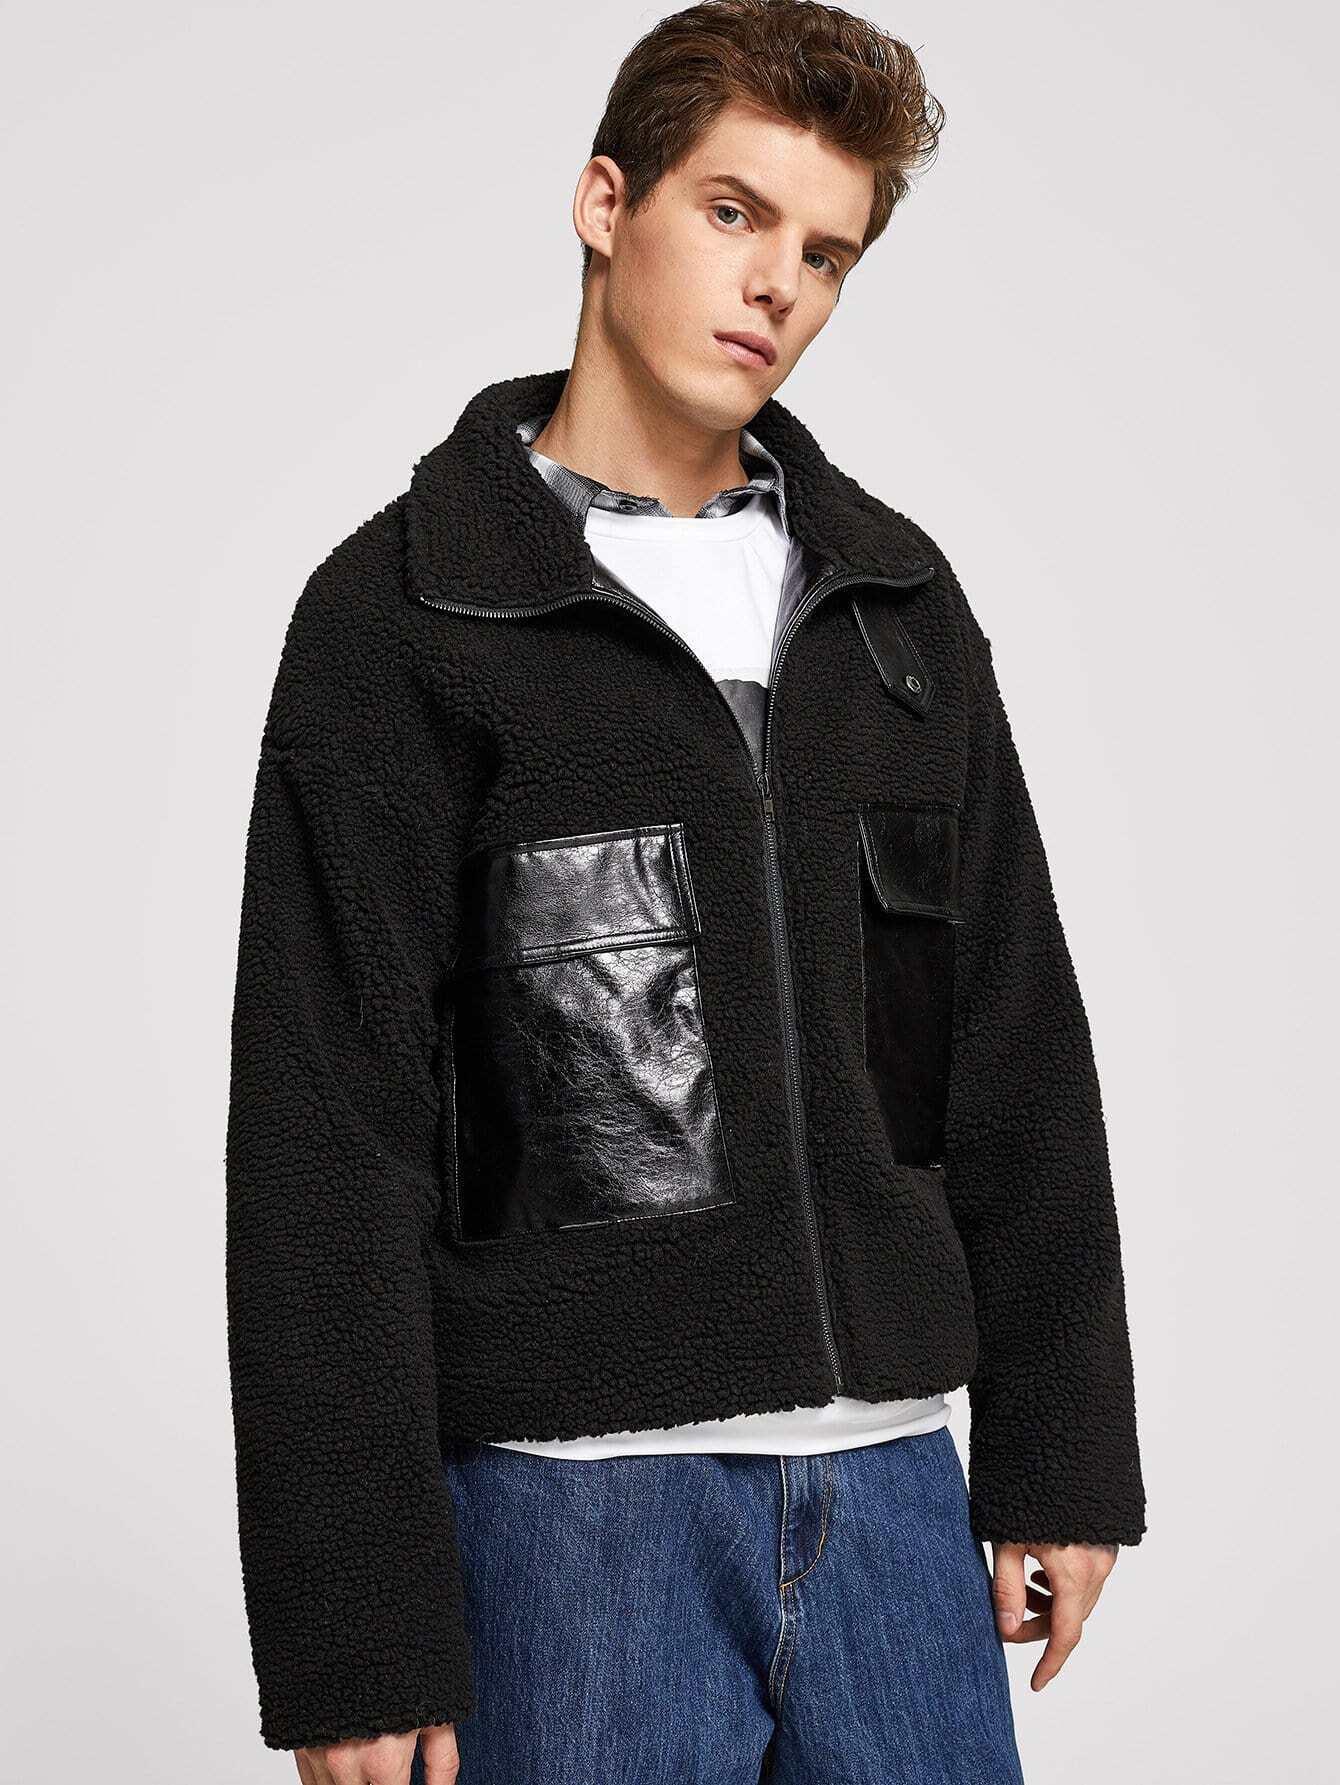 Купить Для мужчин PU тедди куртка на молнии с карманом, Roman P, SheIn